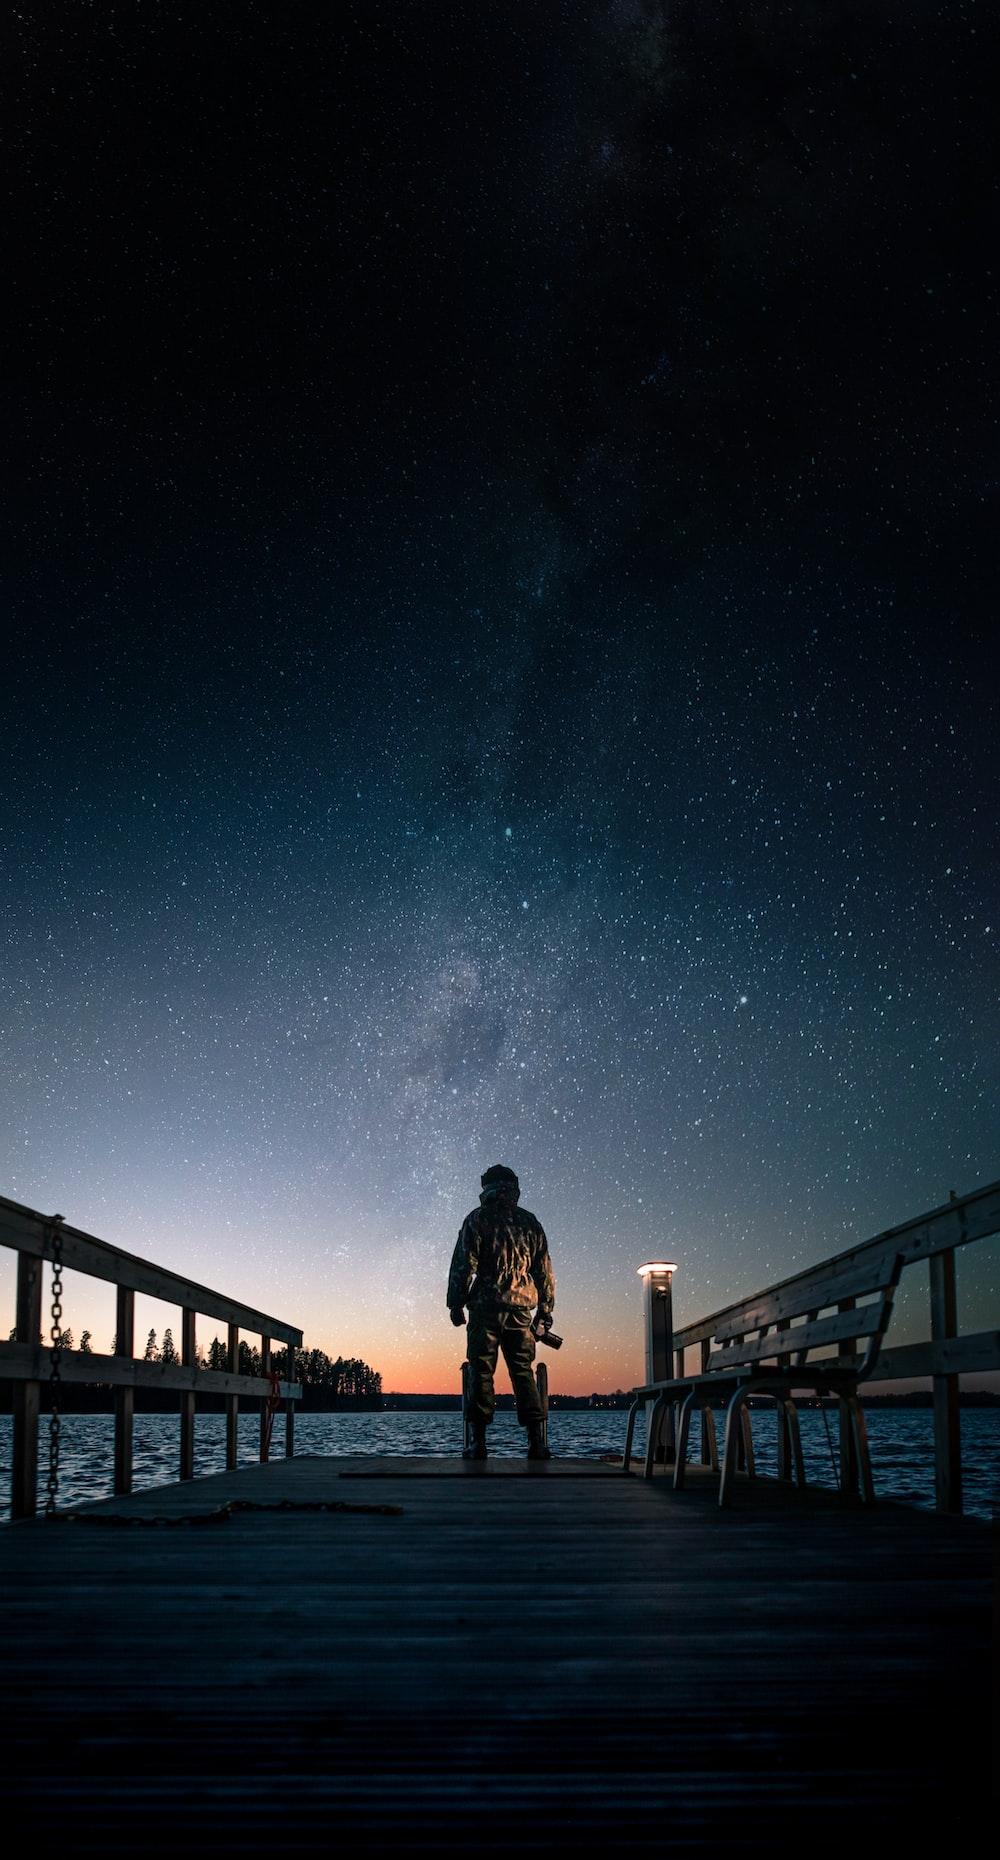 man in black jacket standing on brown wooden bridge under starry night